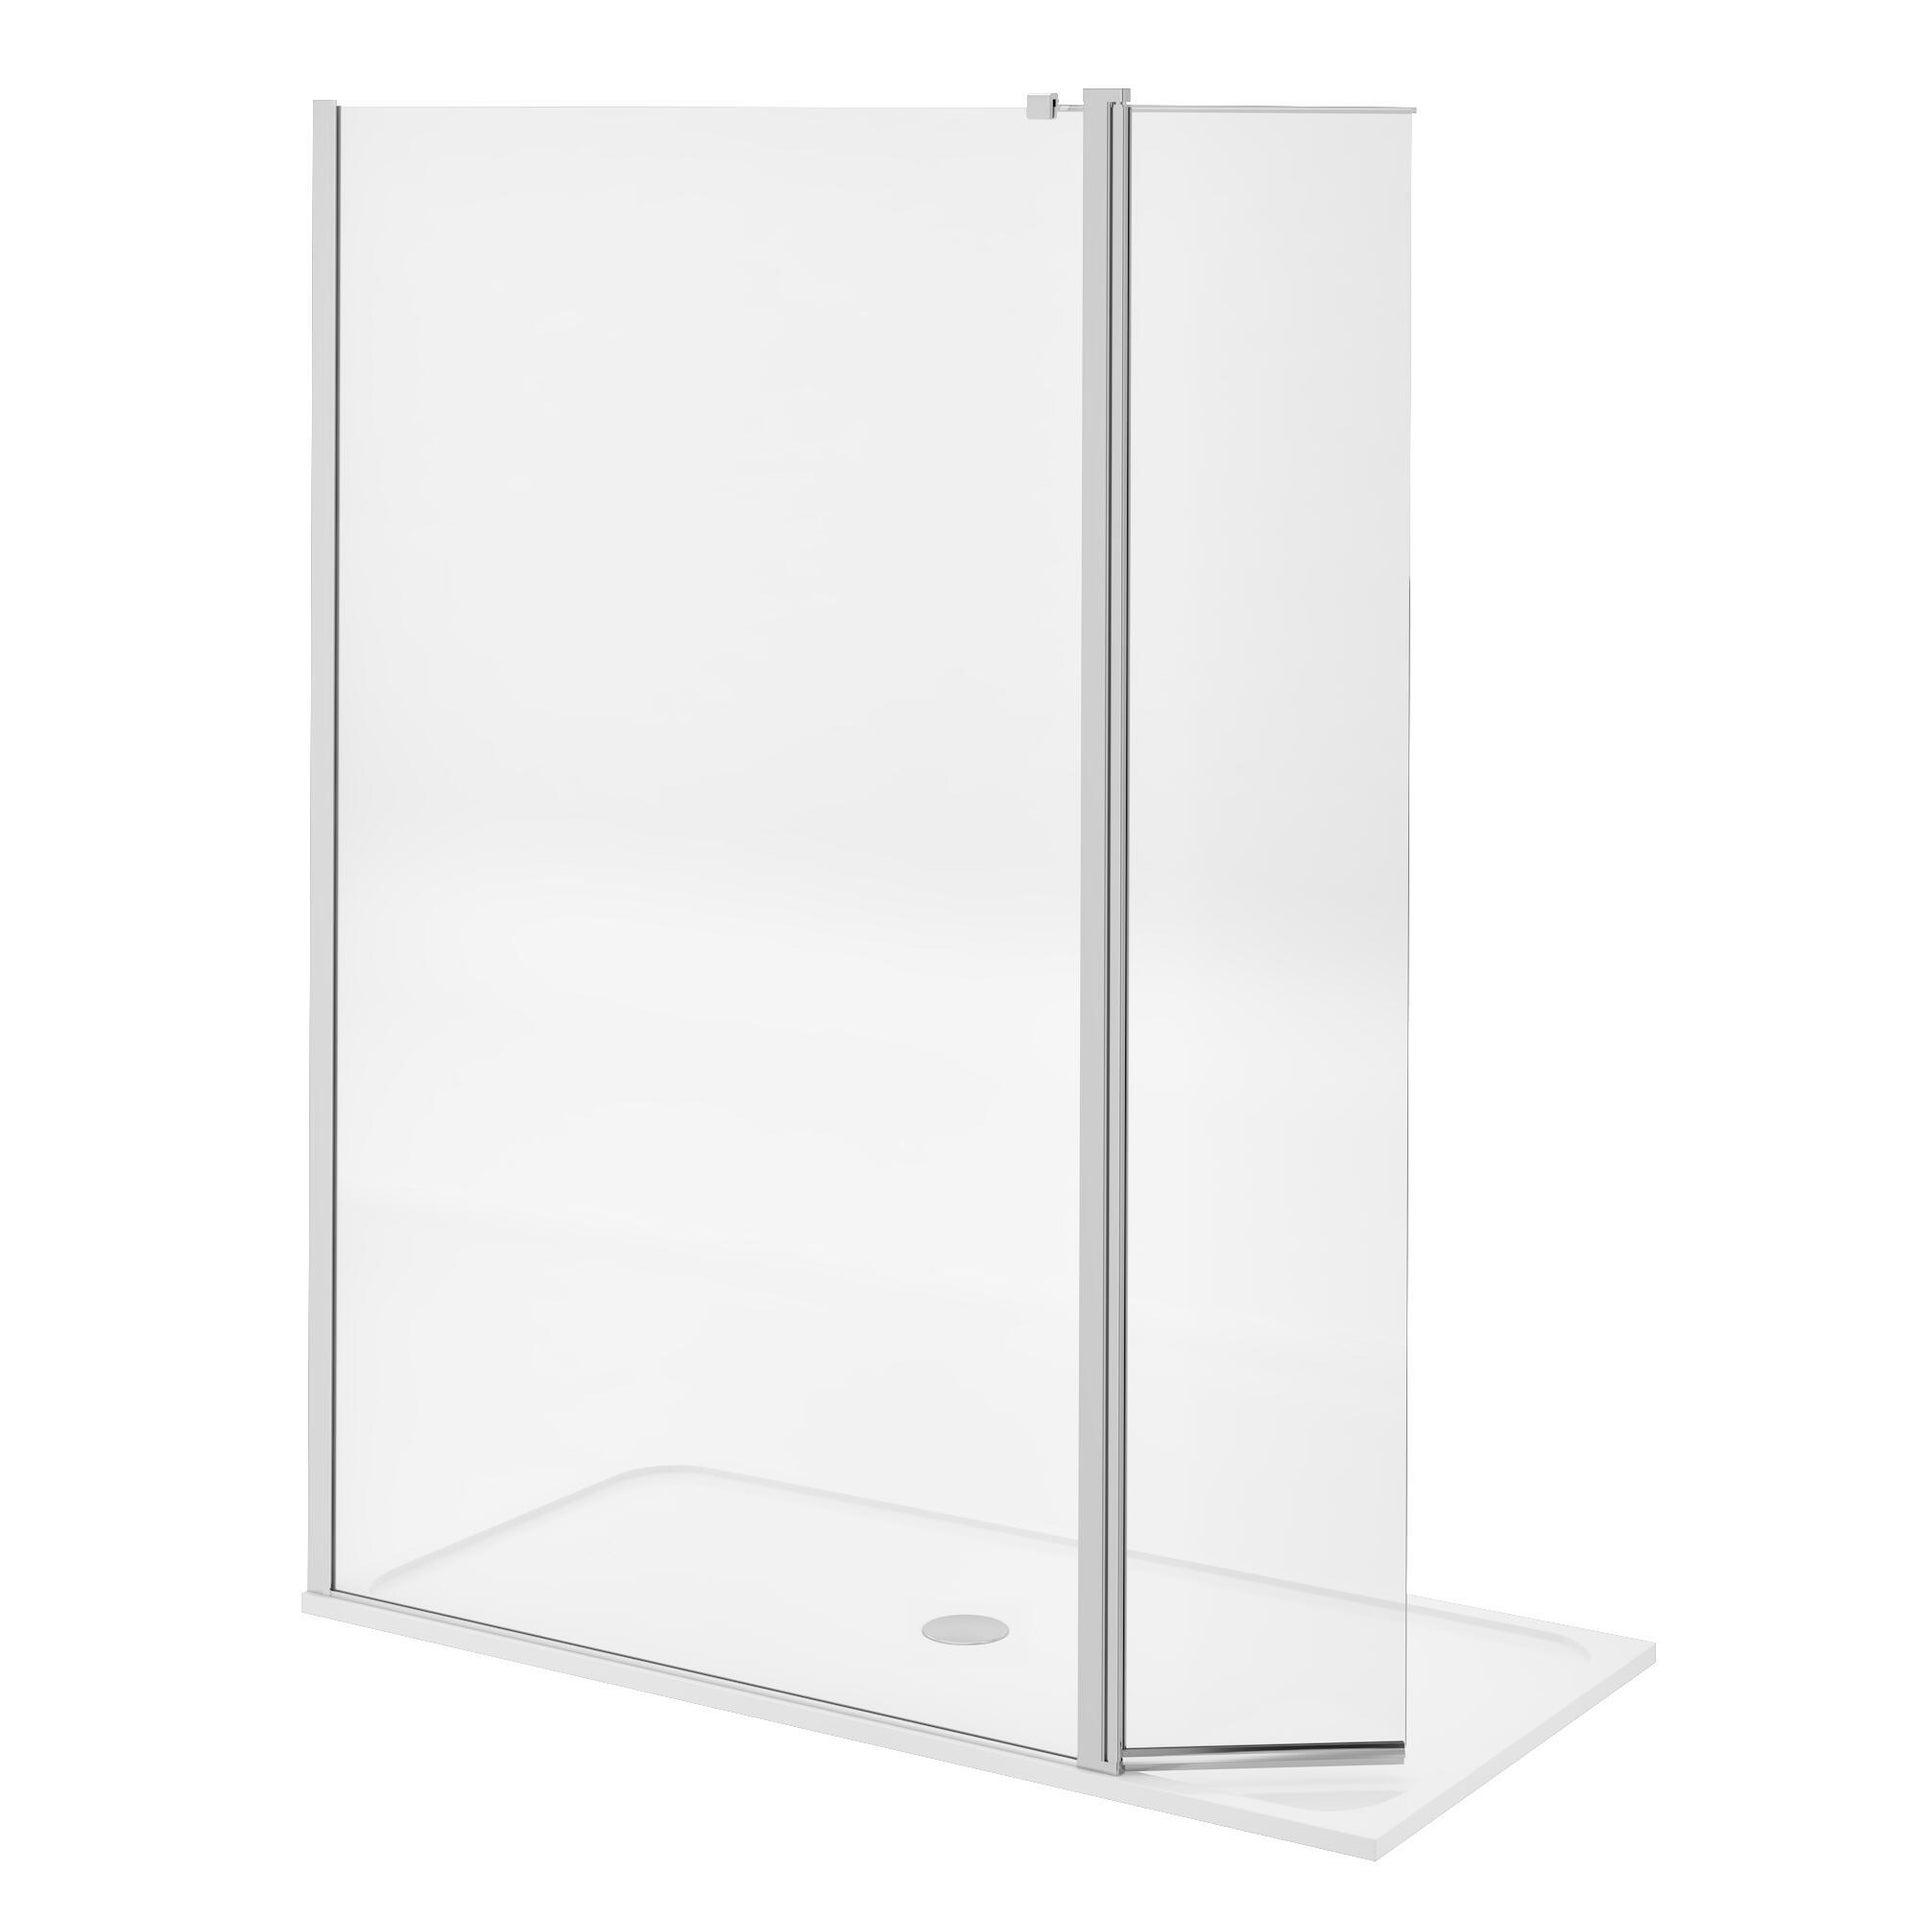 Doccia walk in L 120, H 200 cm, vetro 8 mm trasparente cromato - 16